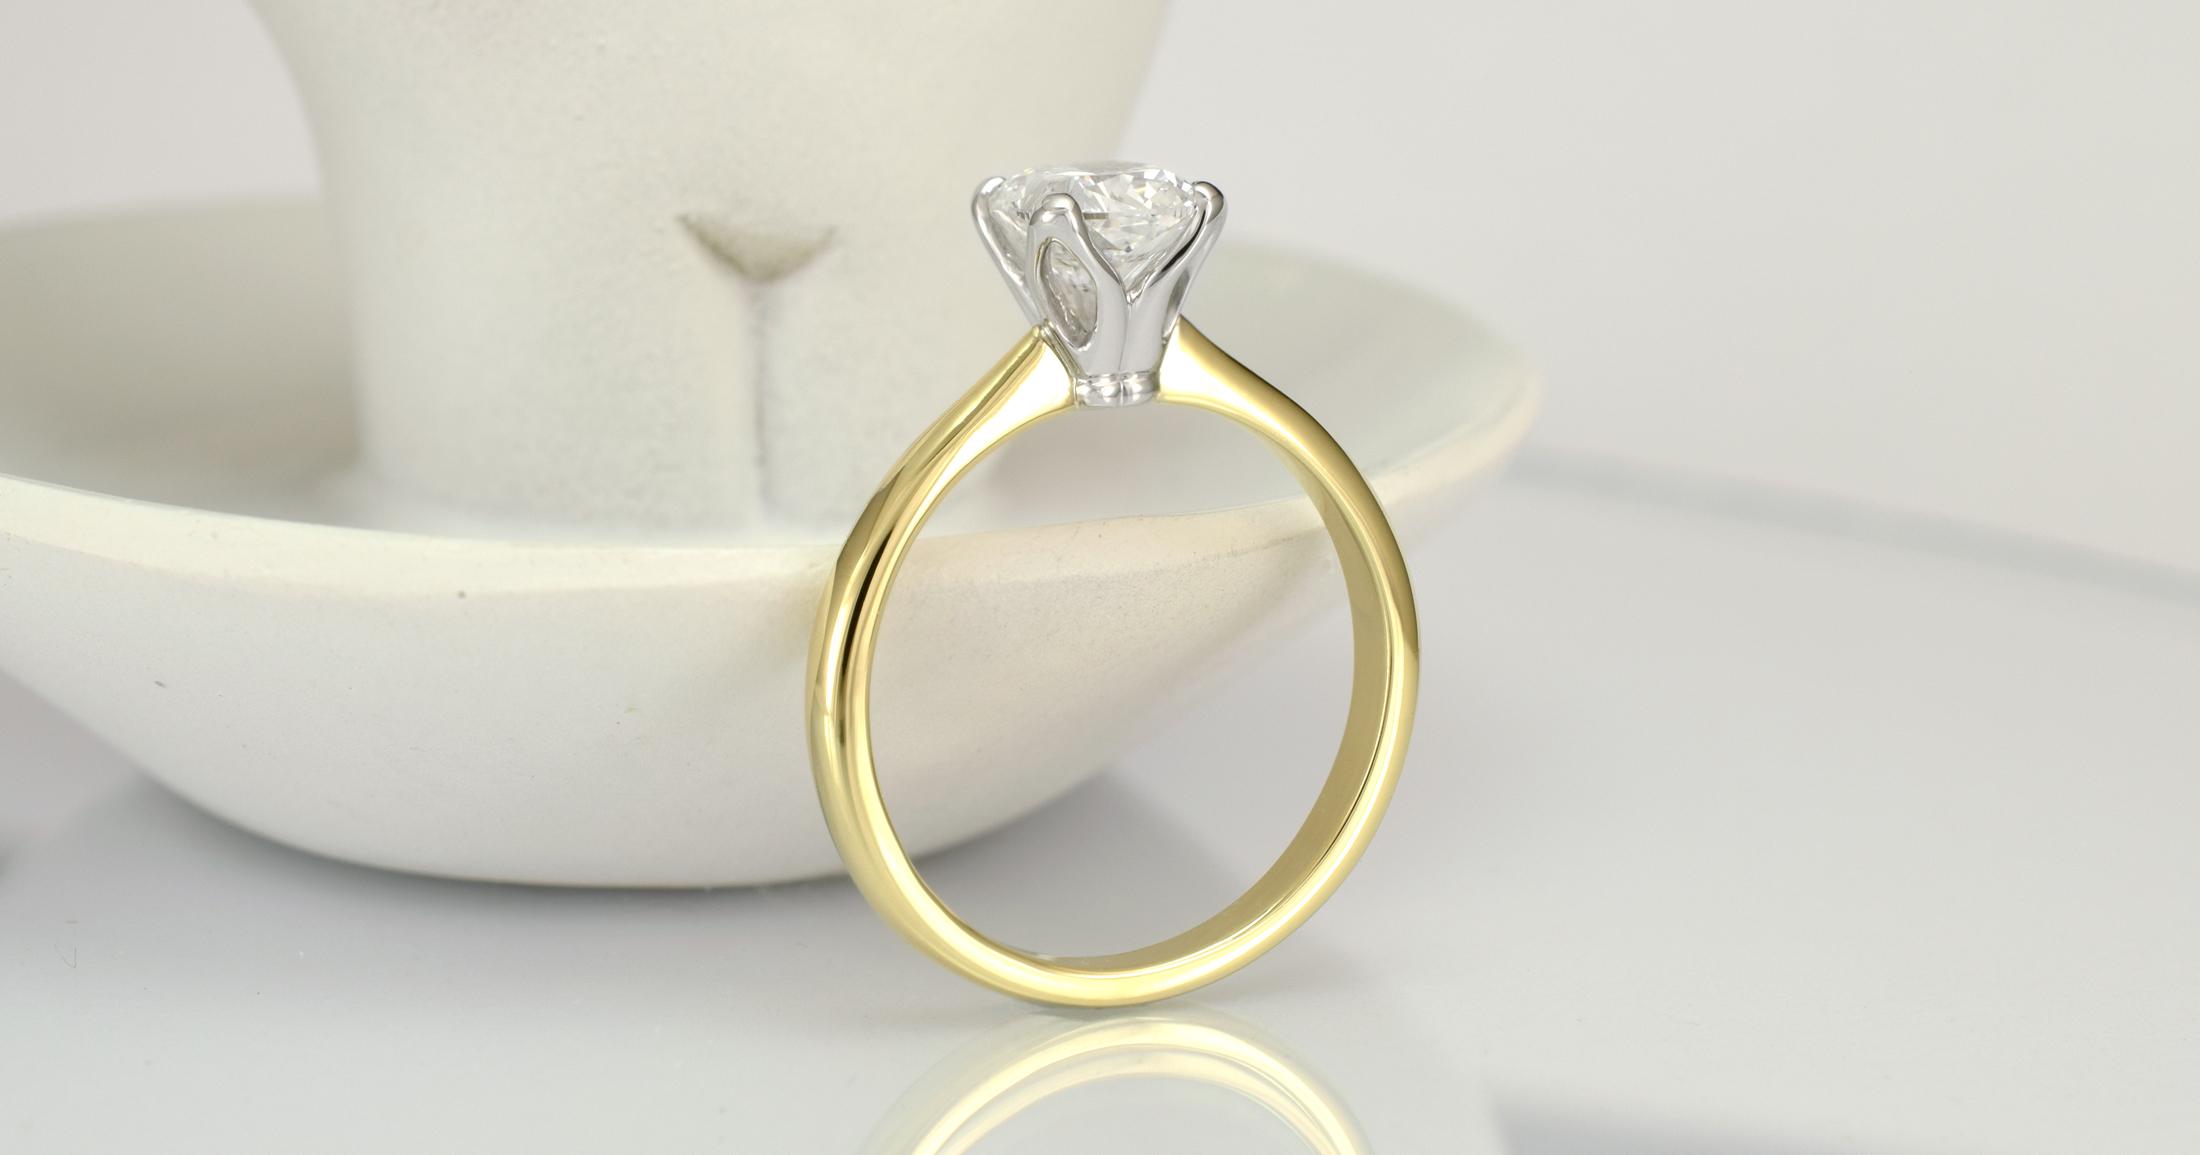 1 carat cushion cut in a temporary ring.